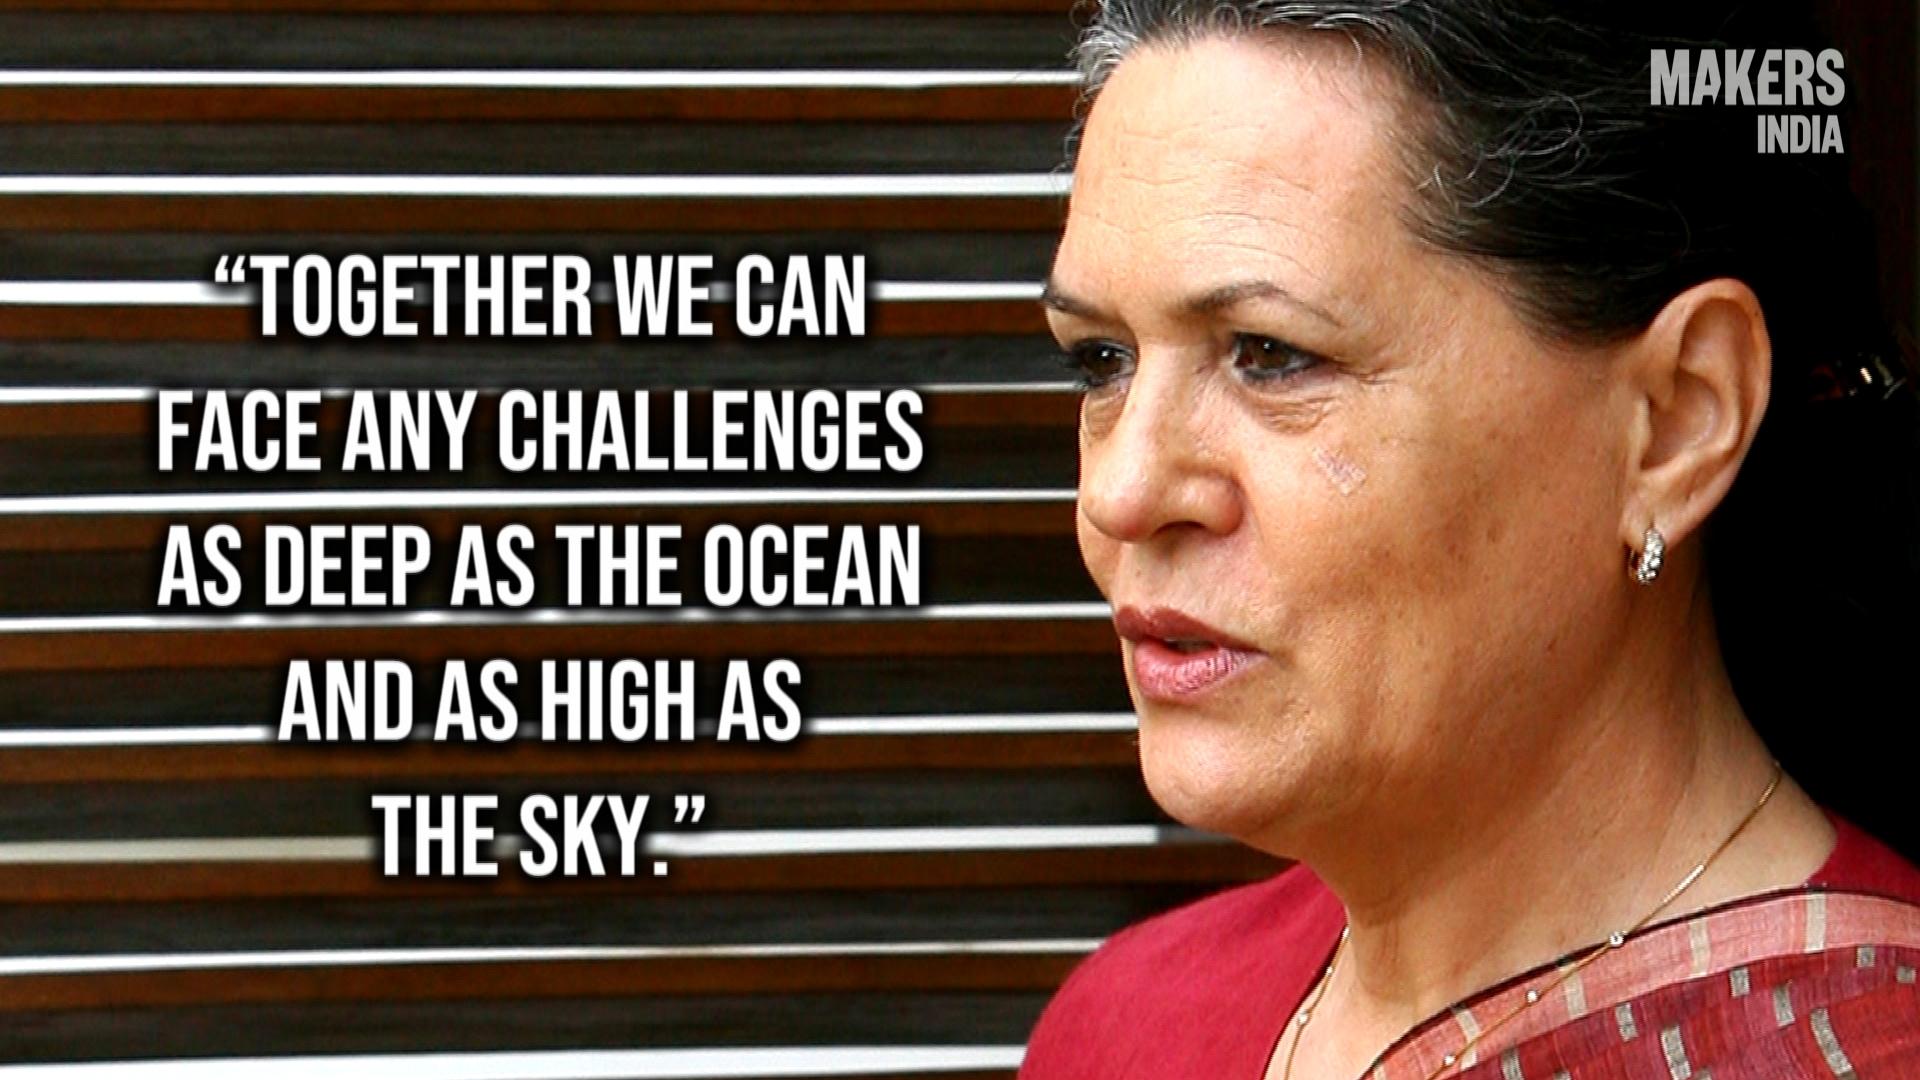 Sonia Gandhi: Power In Itself Has Never Attracted Me, Nor Has Position Been My Goal